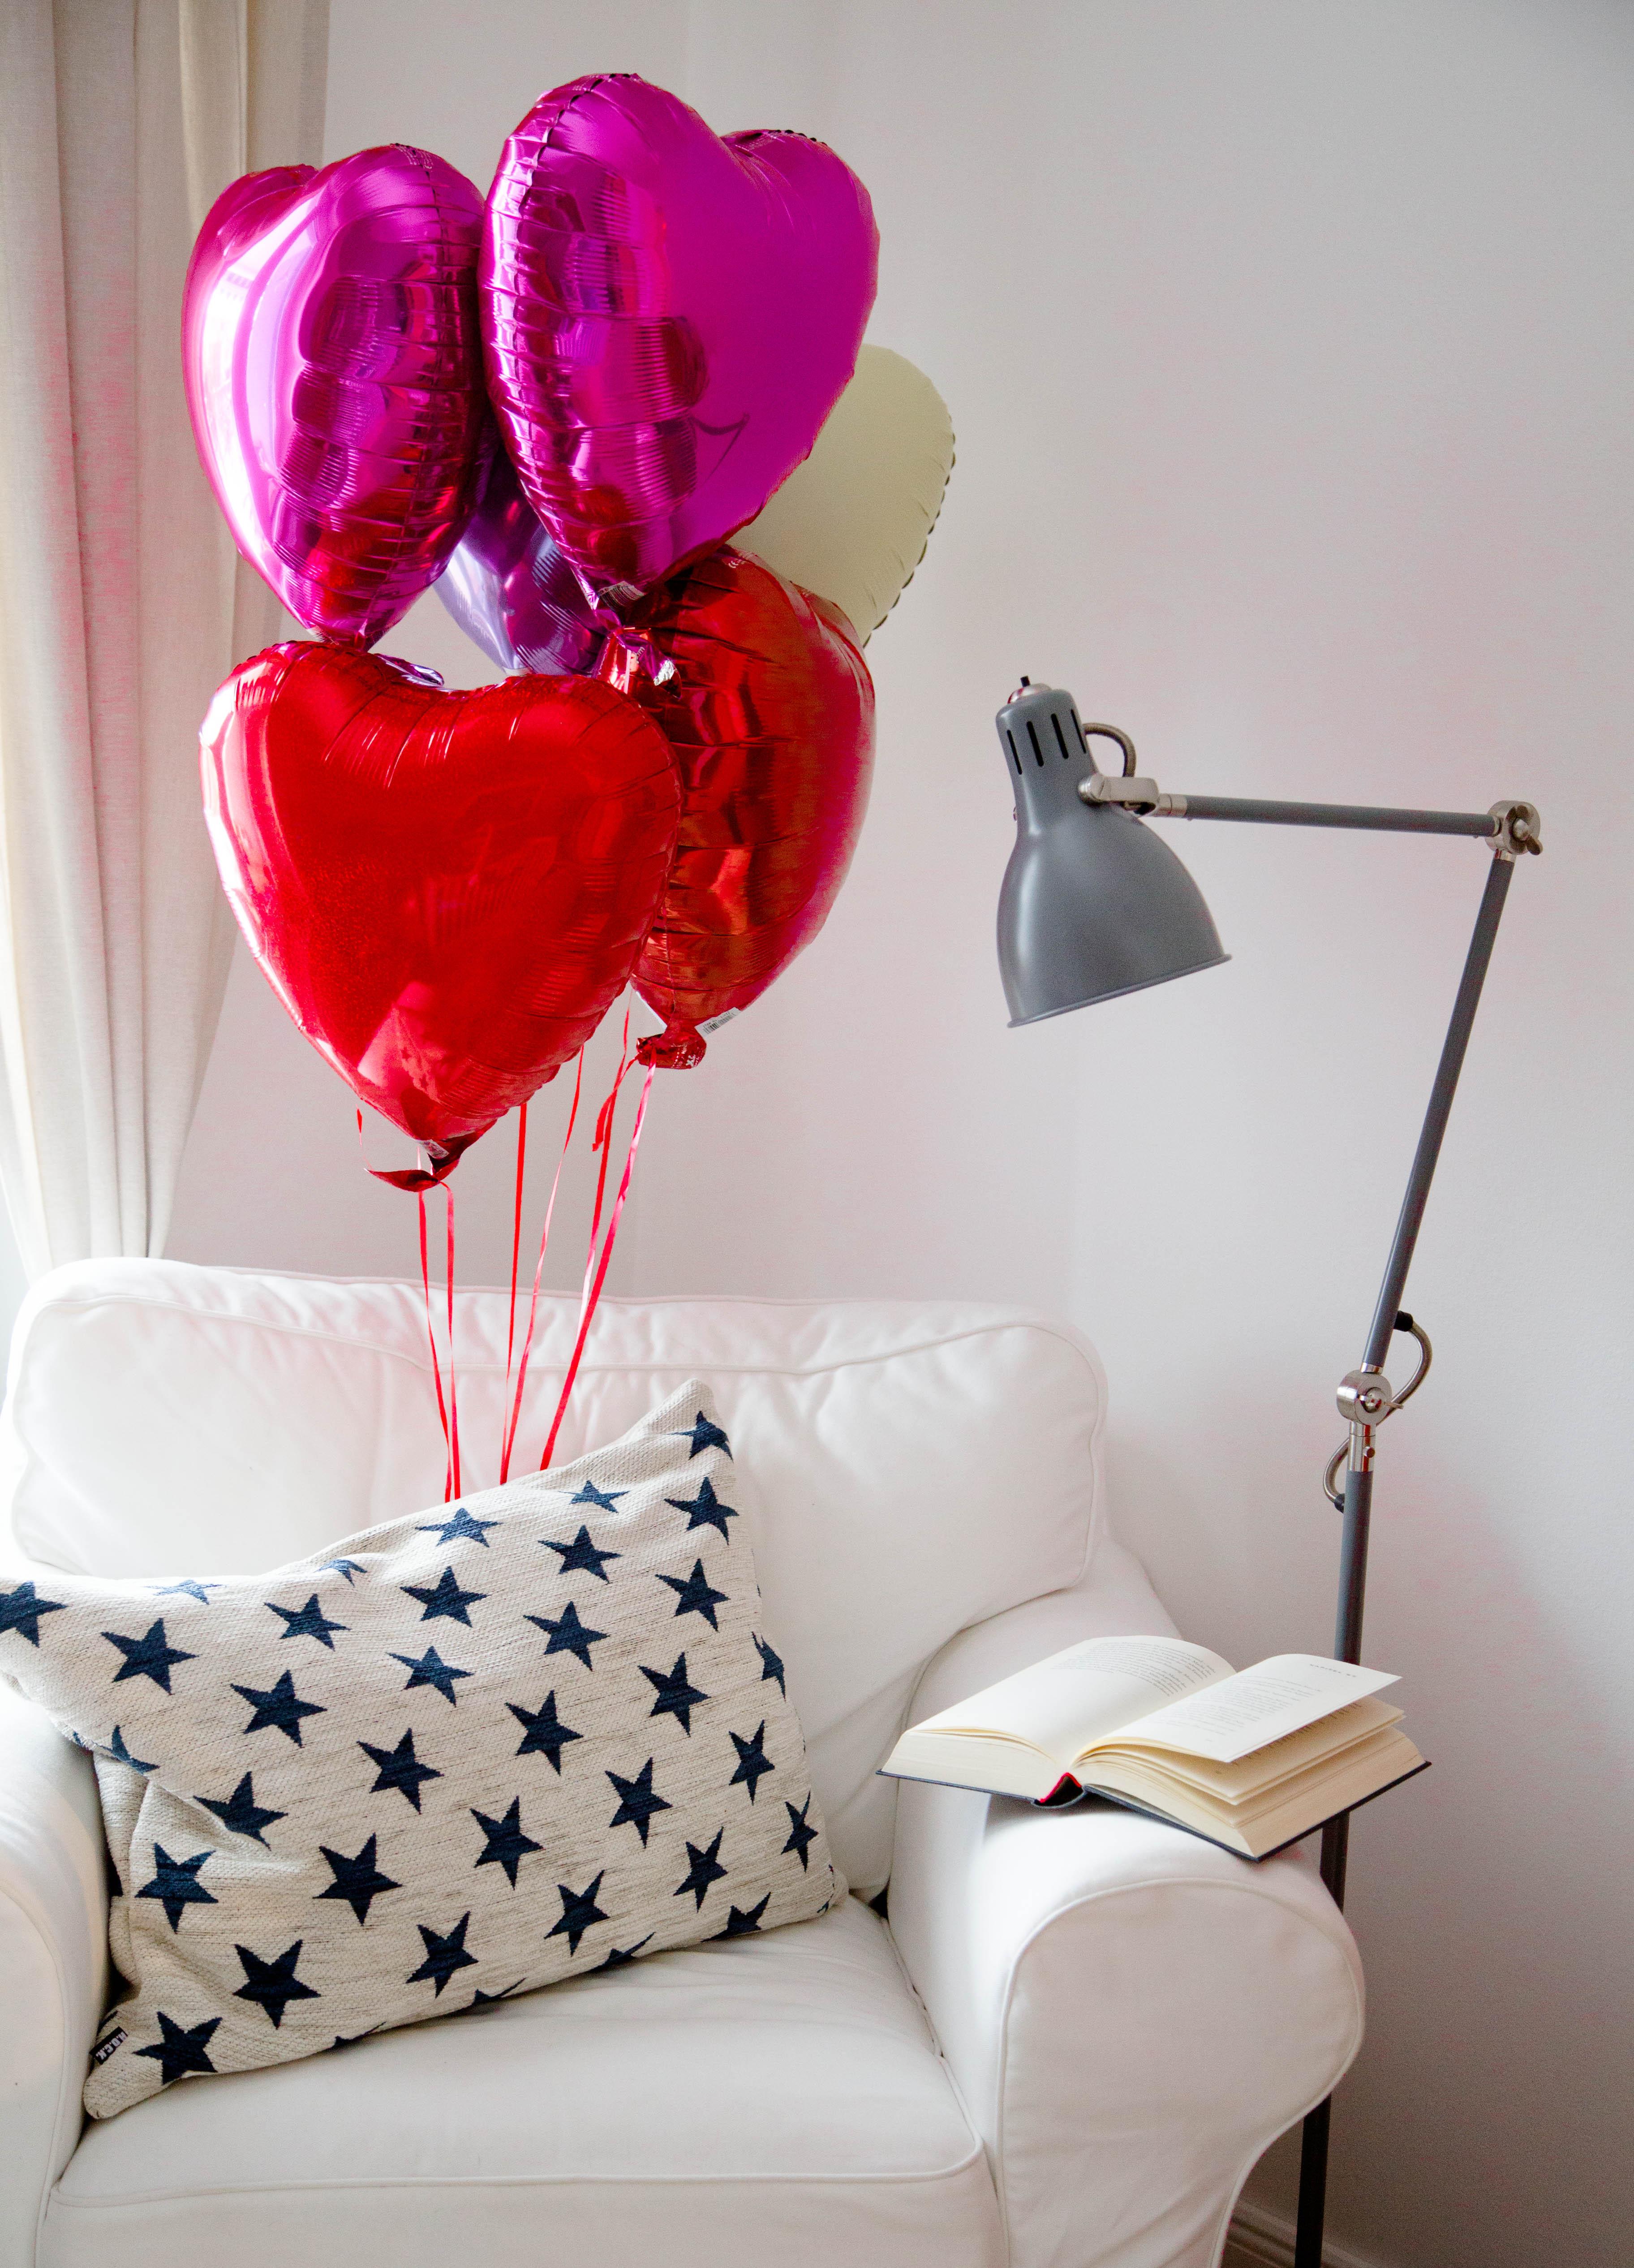 Heliumbefüllte Herzballons im Karton 6er Set Exklusiv